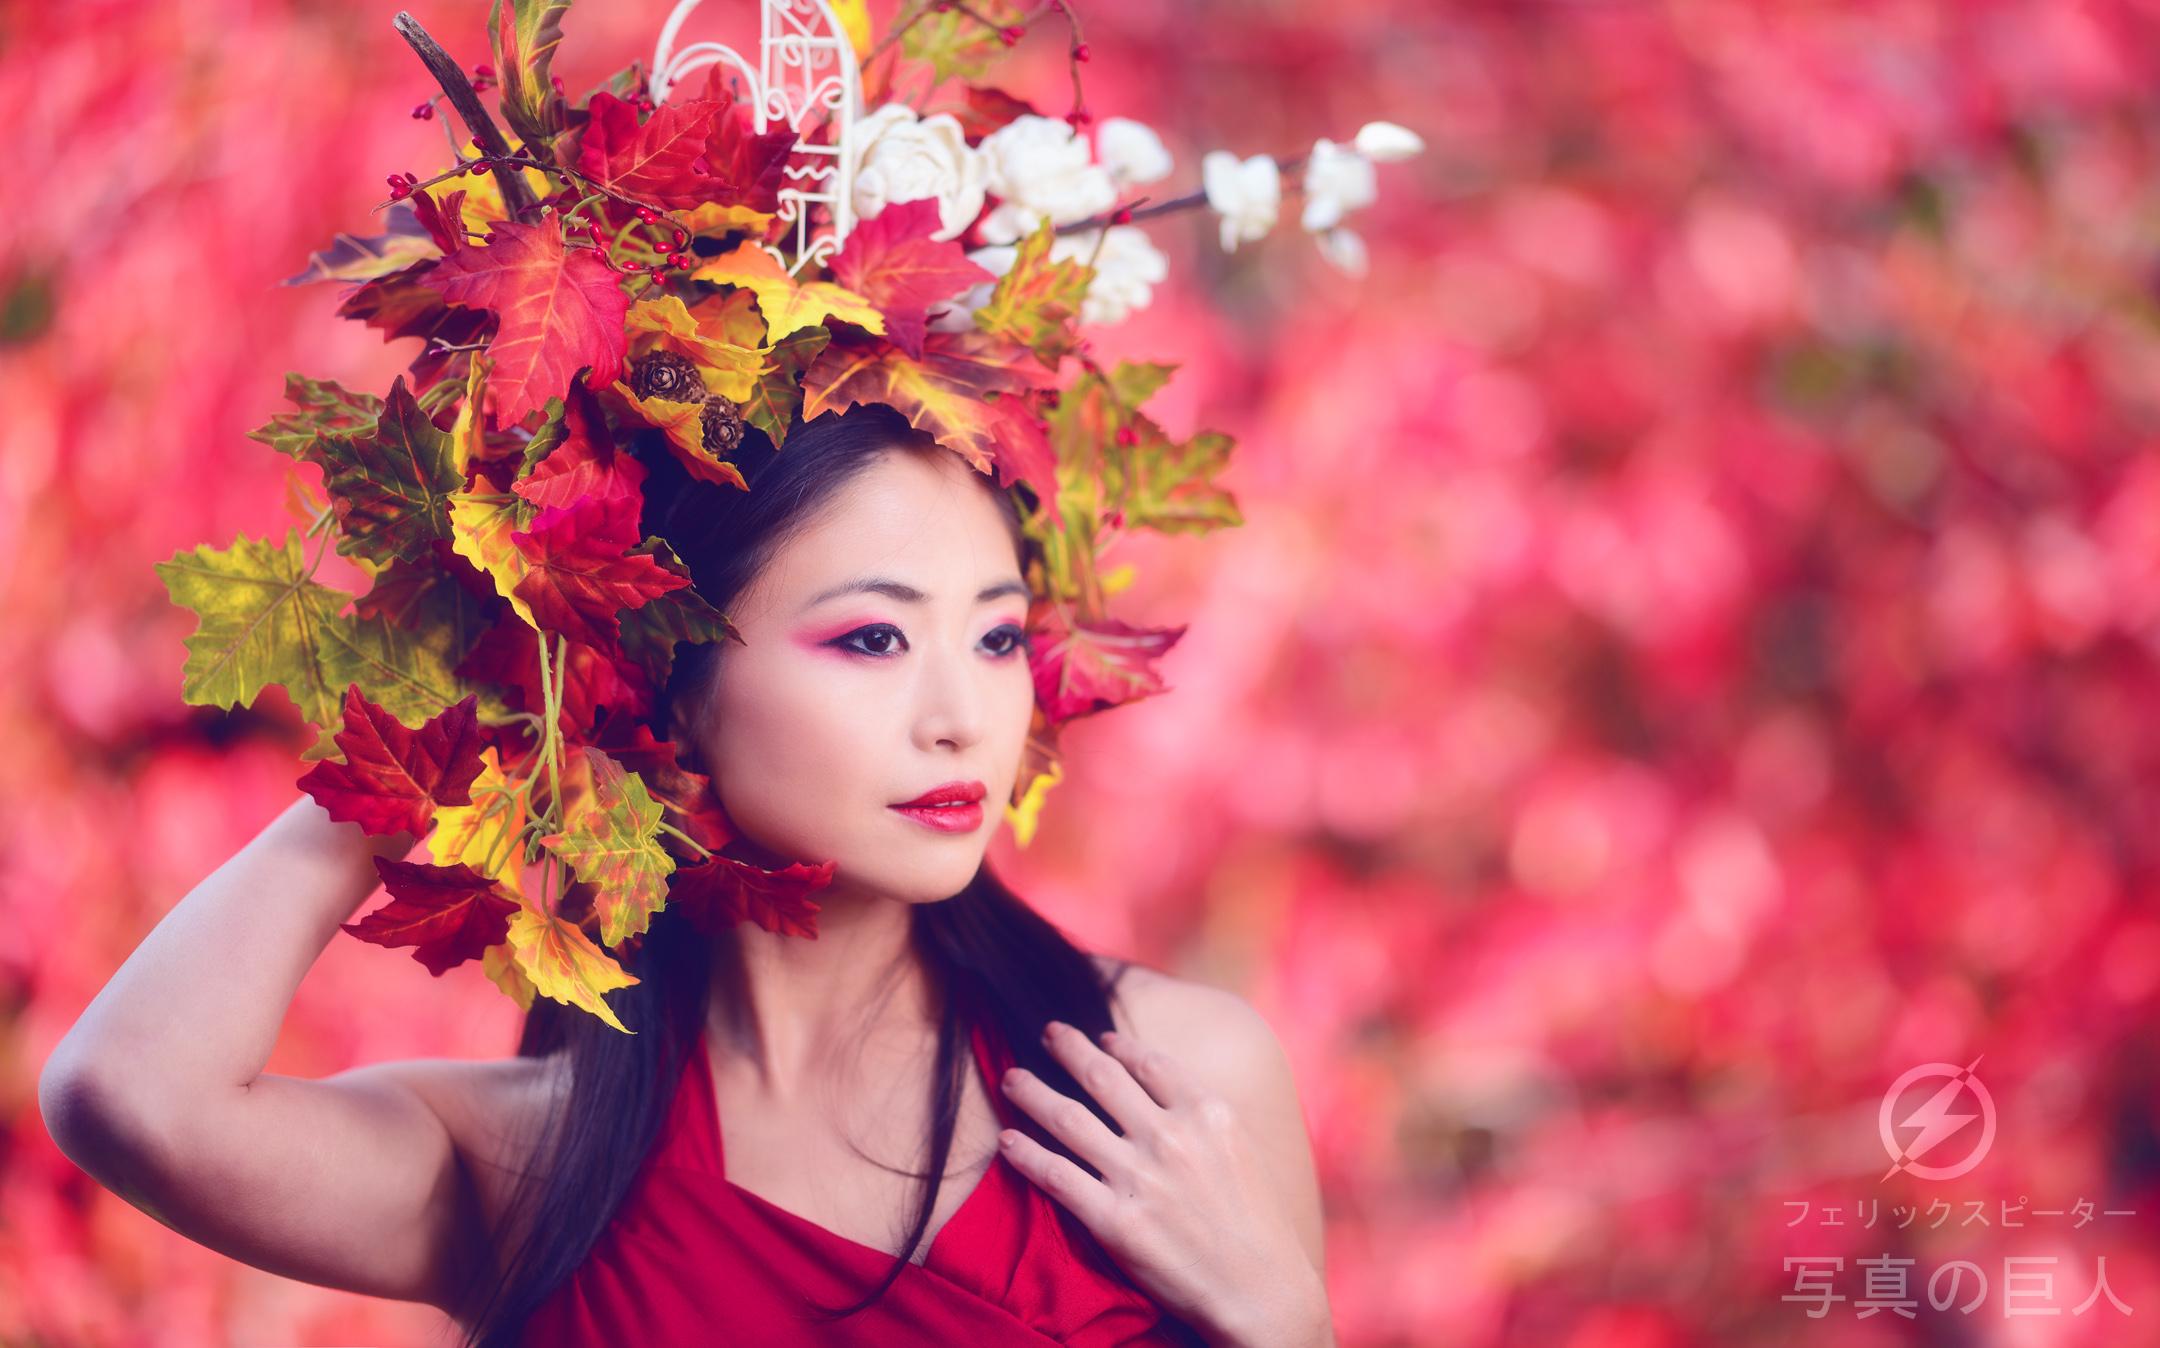 Japanese_Beautymodel_YuWi_FotoGigant_1.jpg